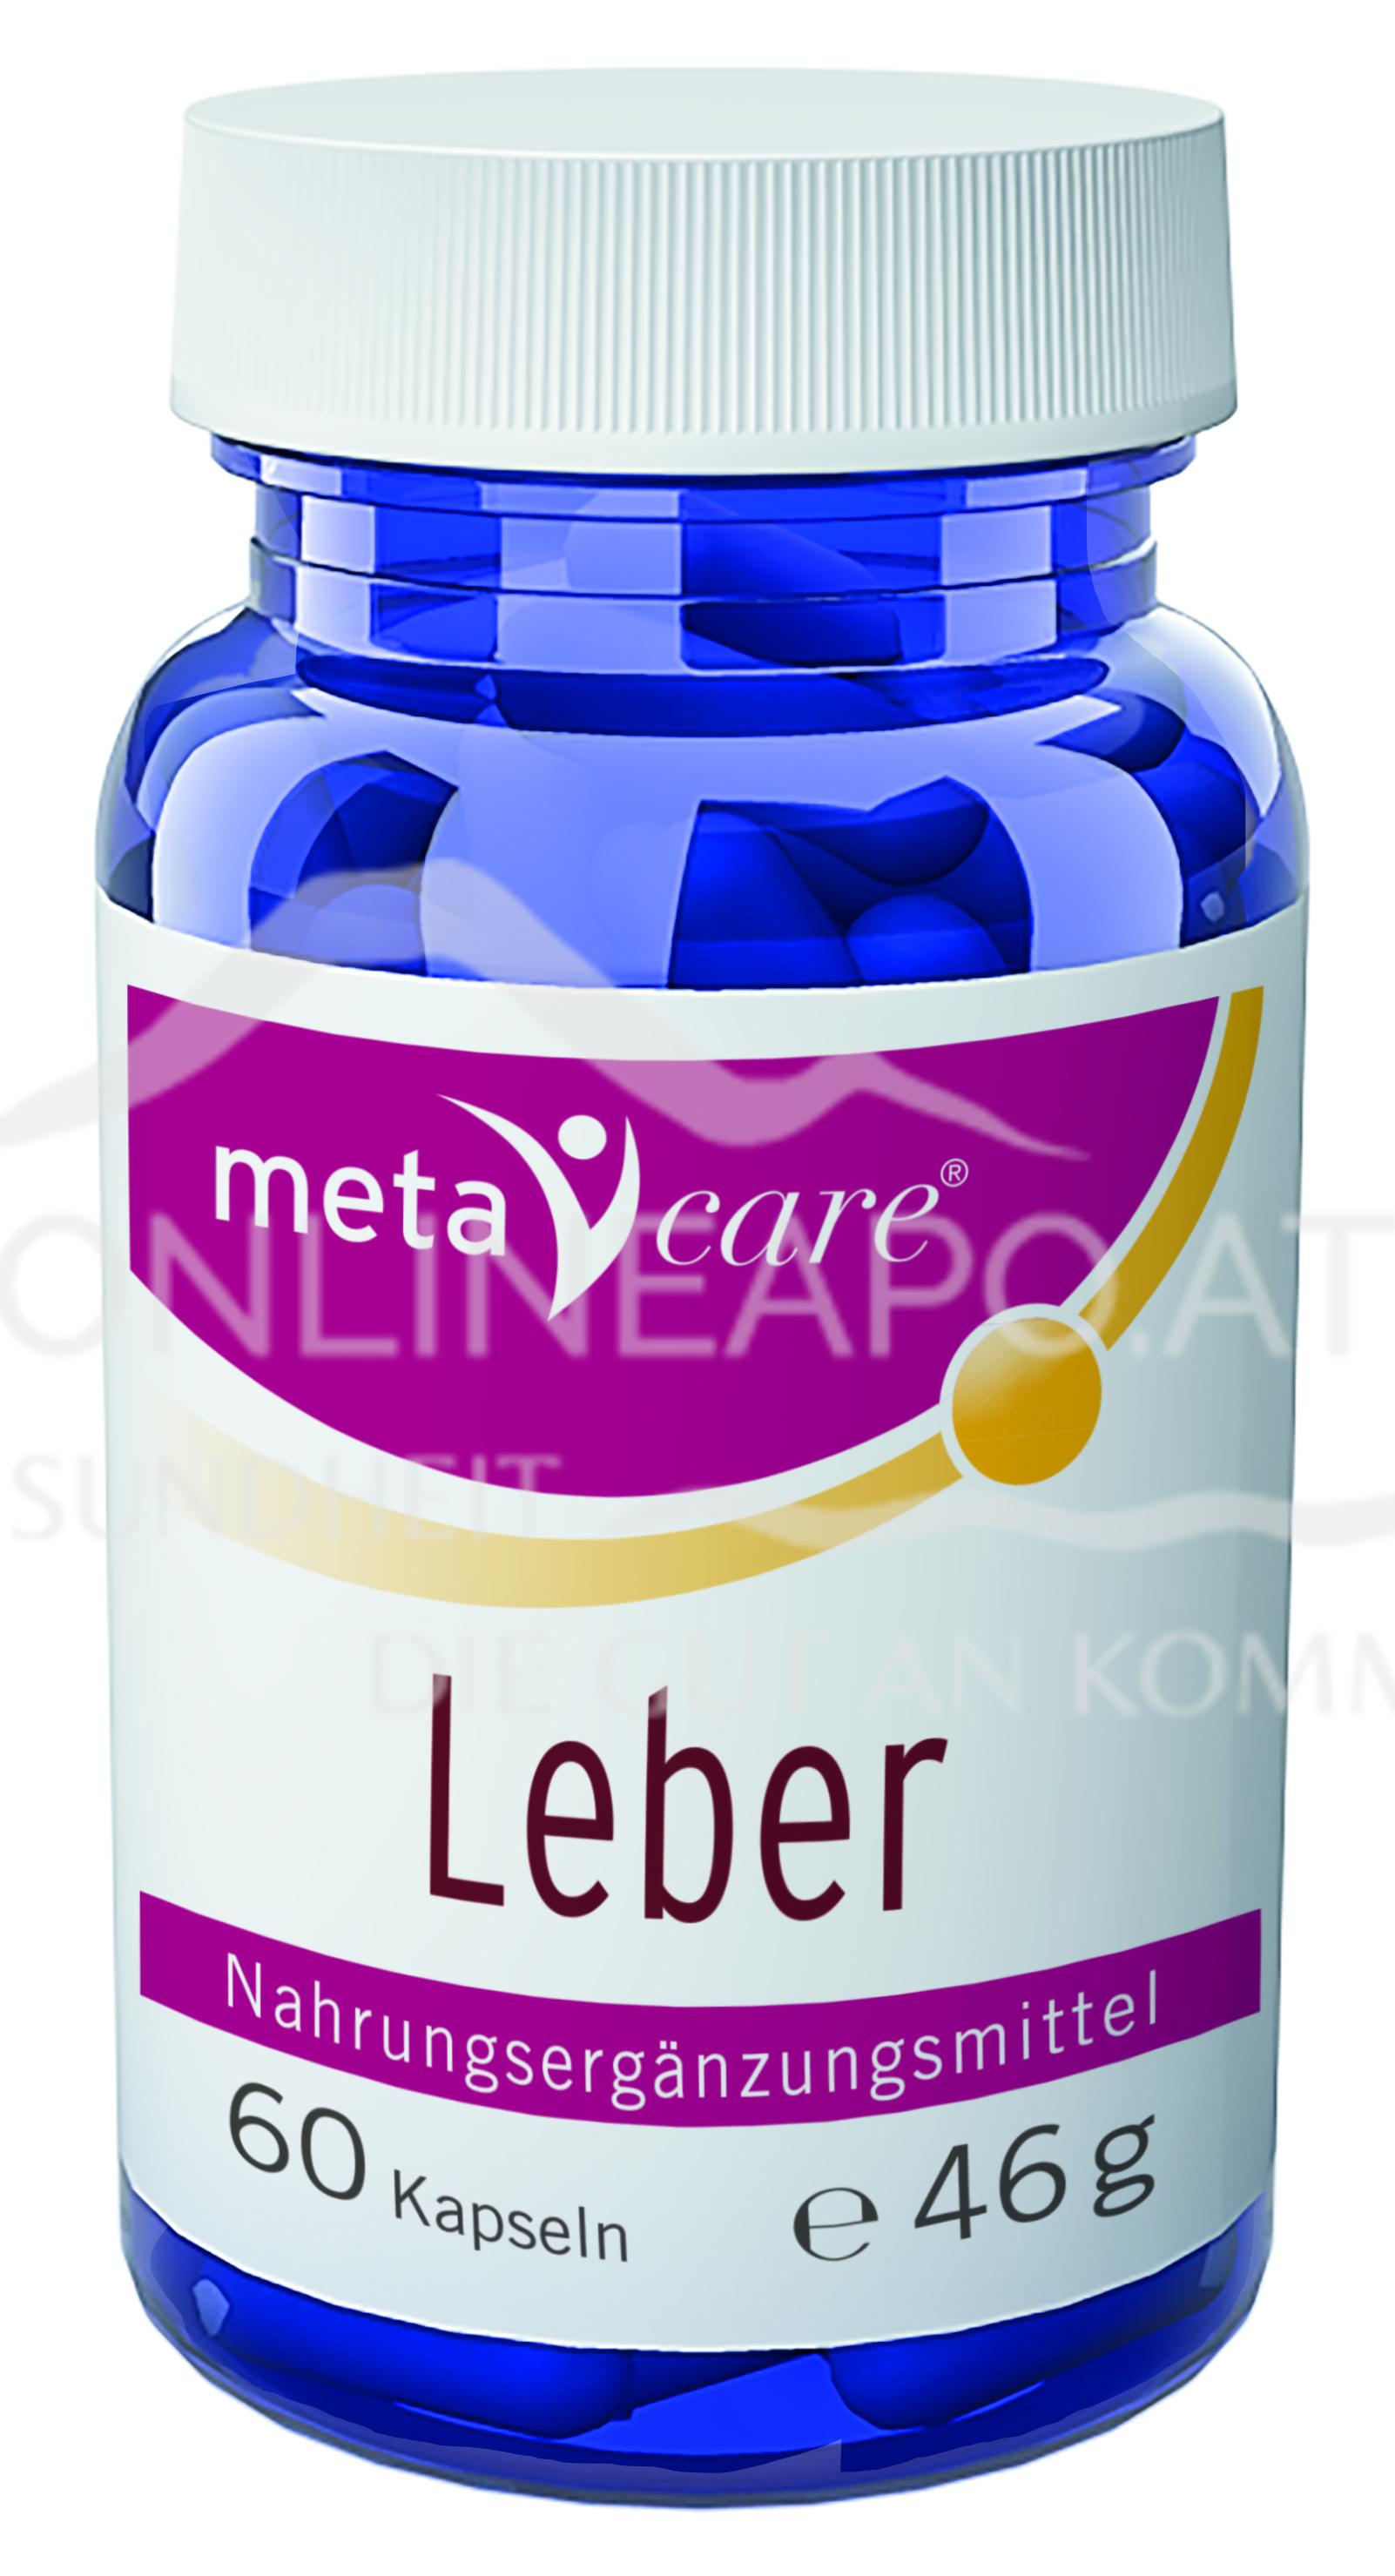 metacare® Leber